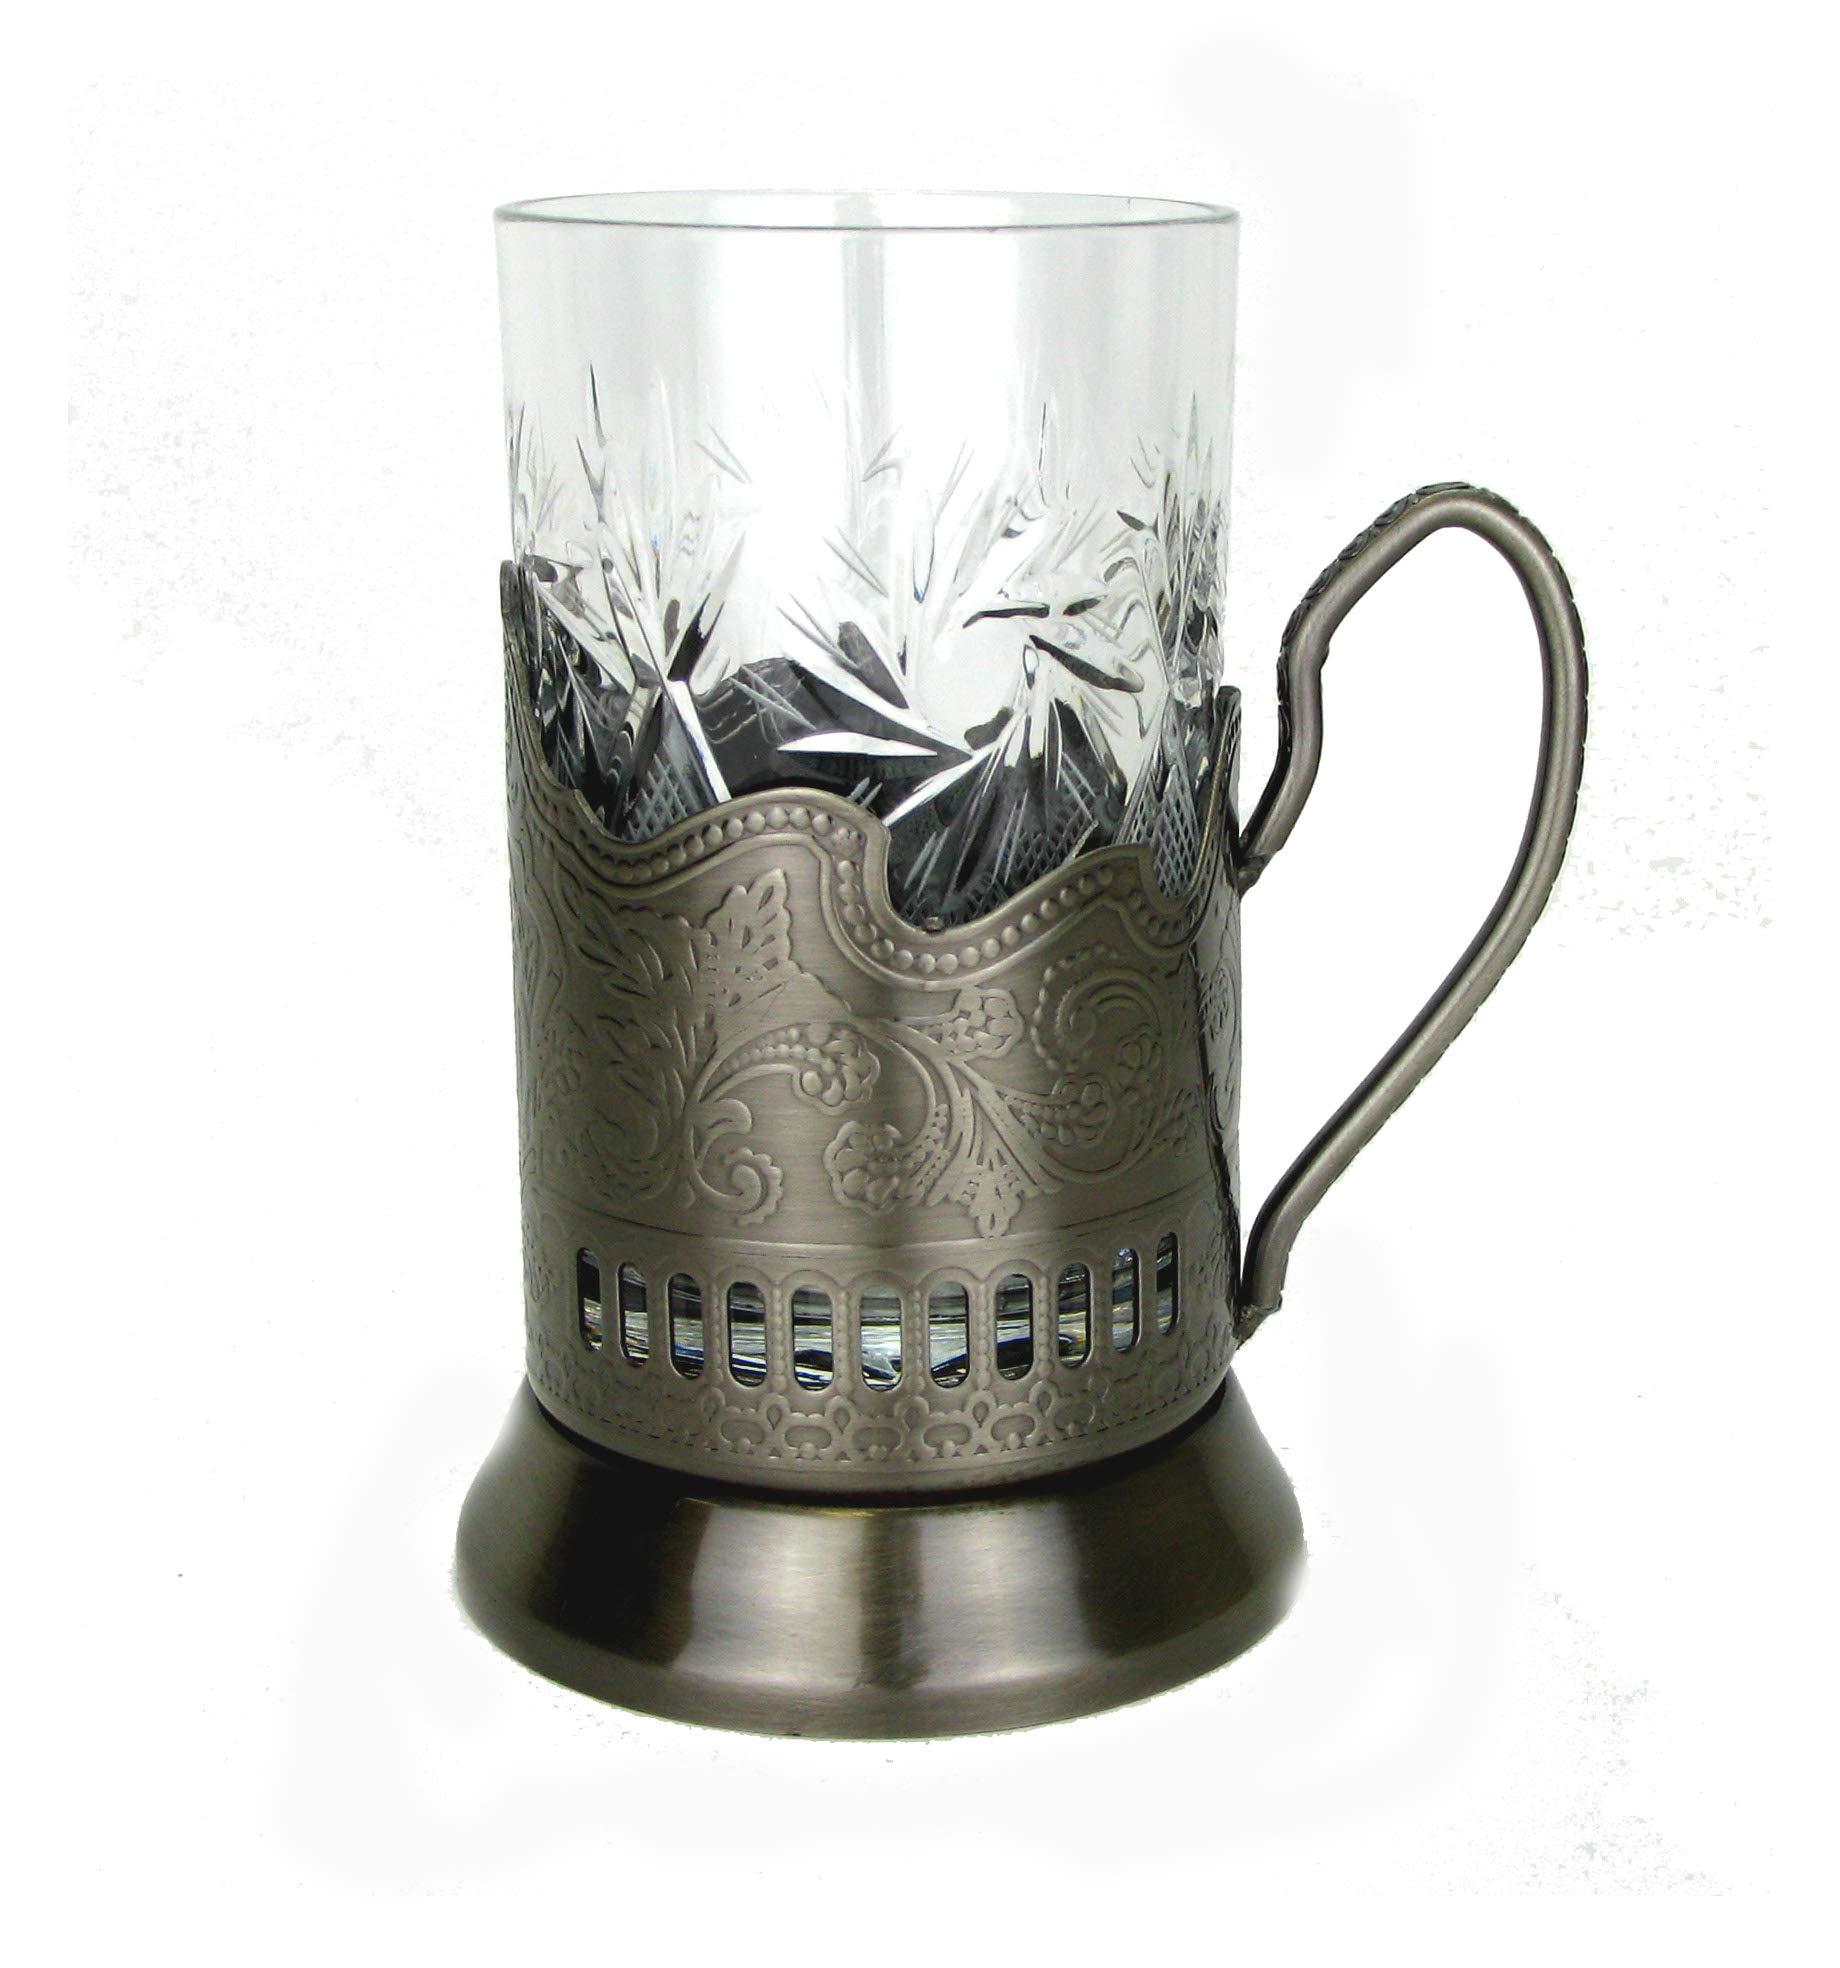 1 Russian Crystal Hot Tea Glass 8.5 Oz & 1 Metal Glass Holder Podstakannik by WORLD GIFTS